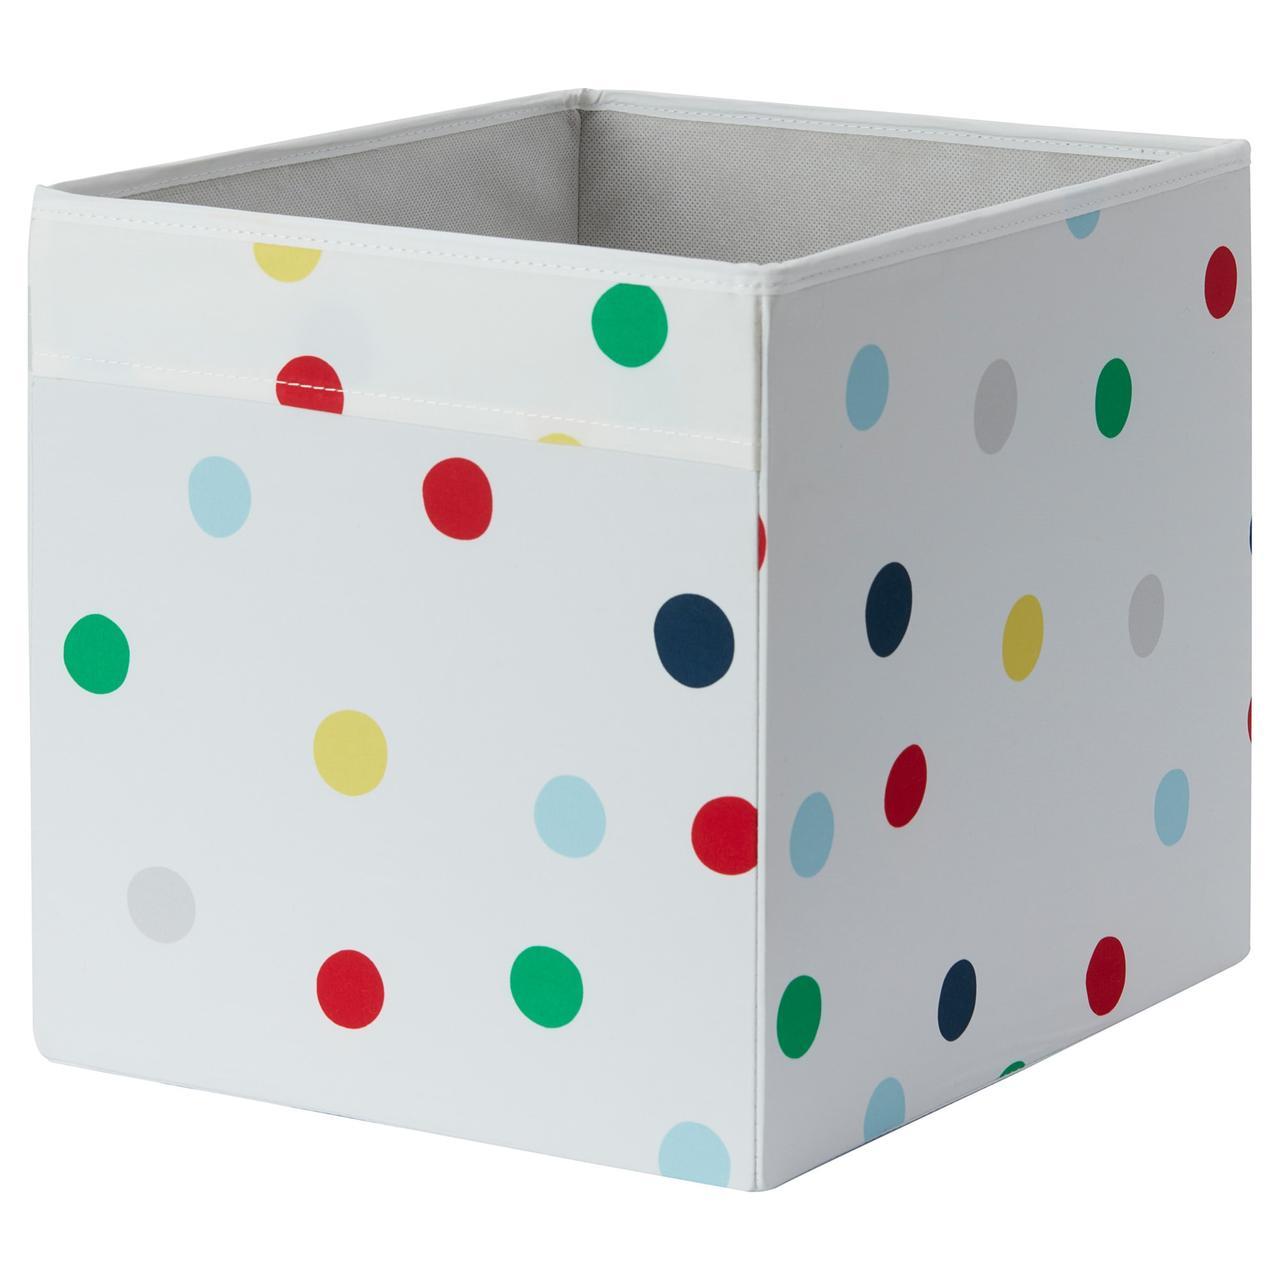 ДРЁНА Коробка, точечный